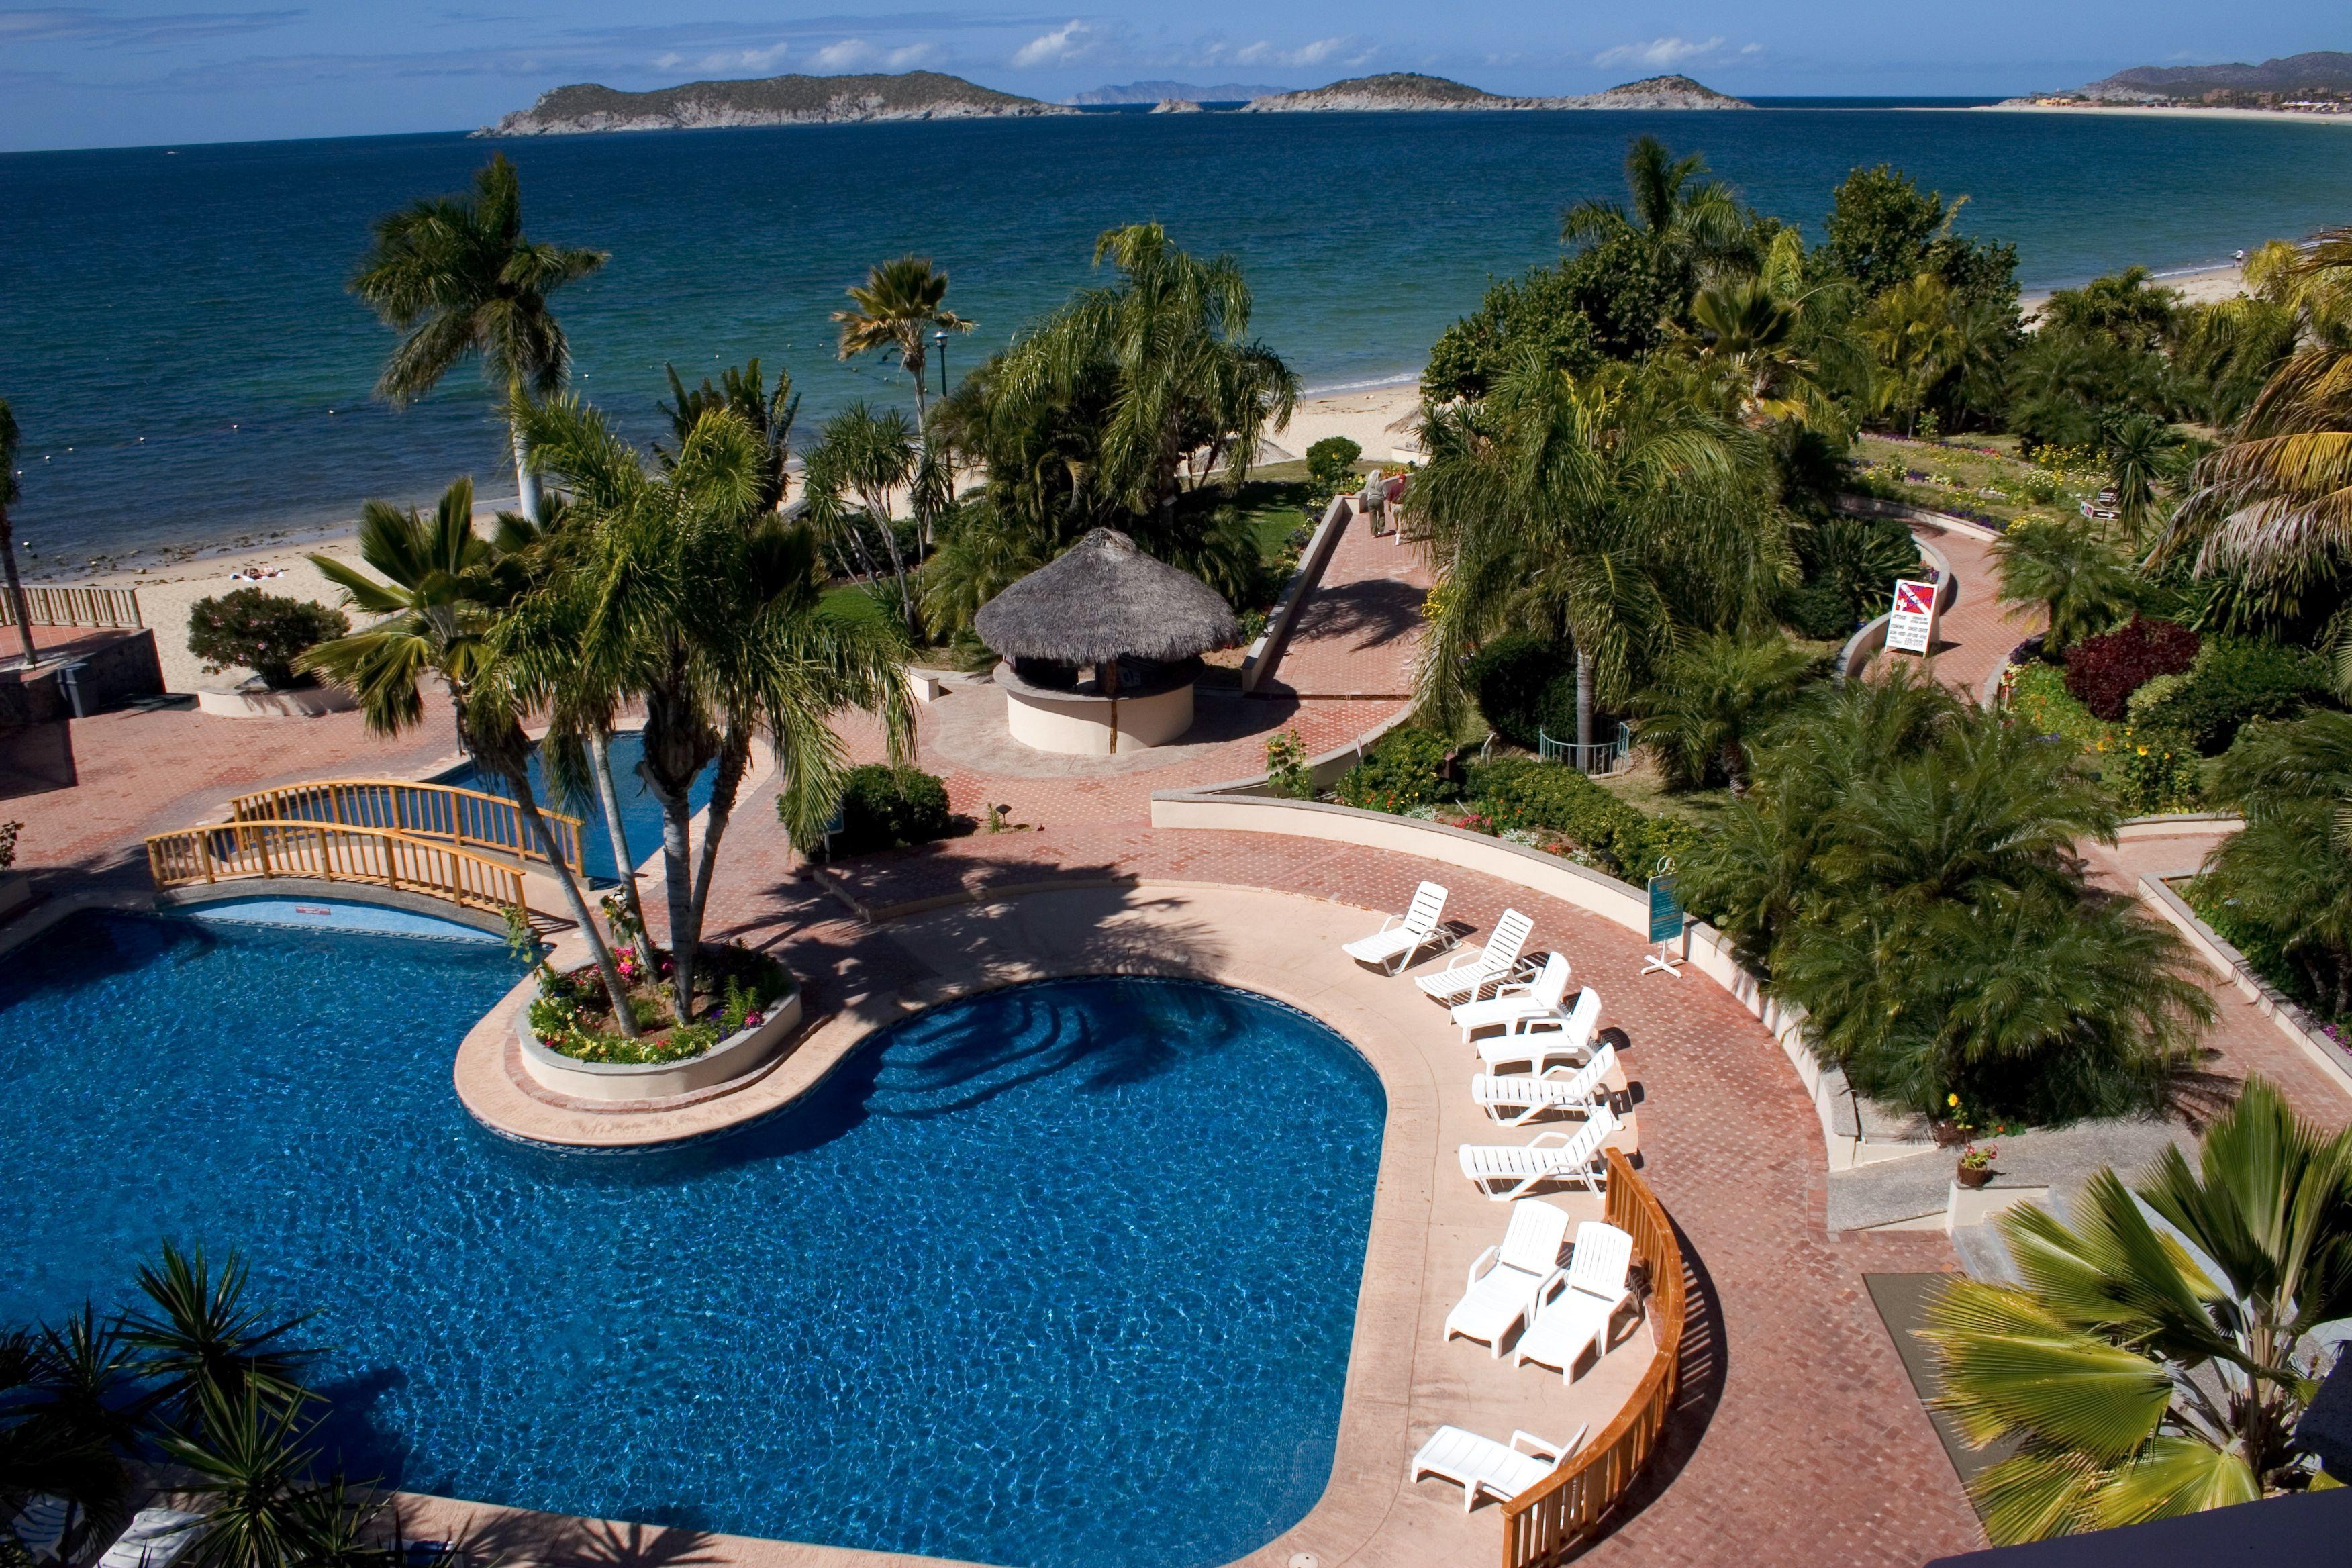 Hotel Mar De Cortez San Carlos 2018 World' Hotels